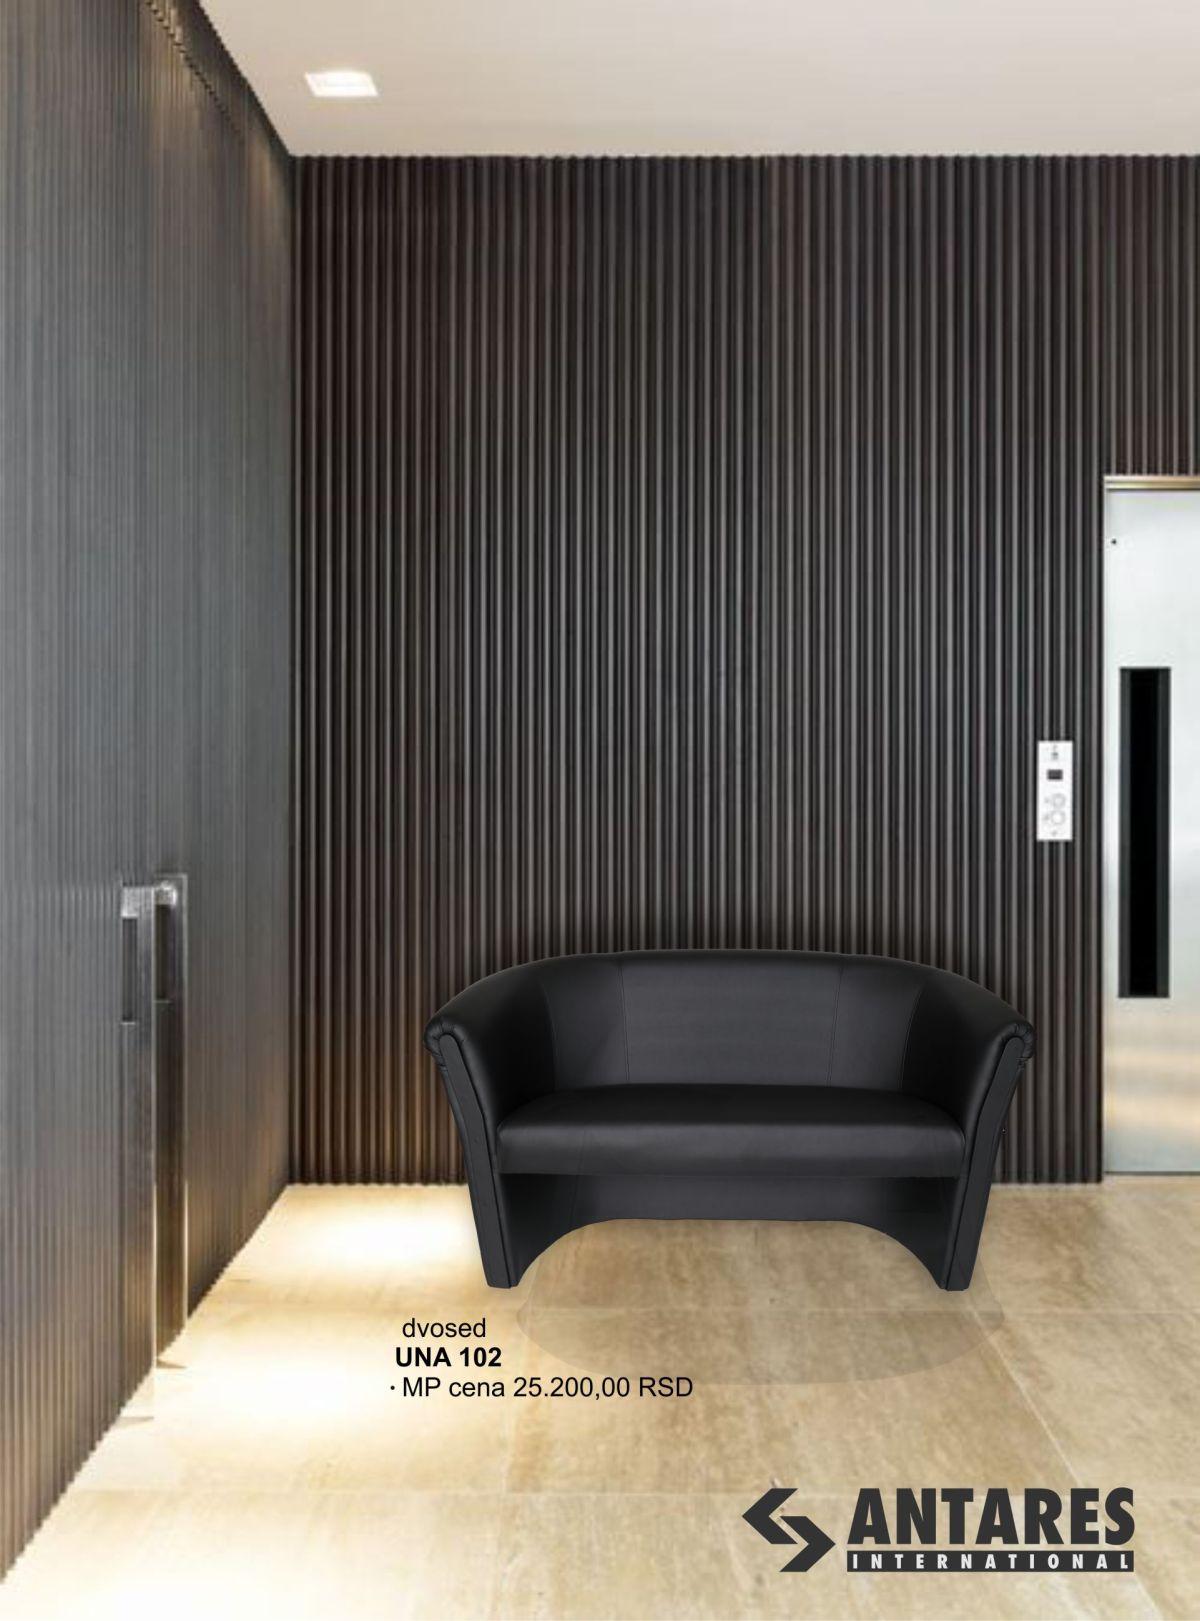 Antares sofa program : GarnituraUNA